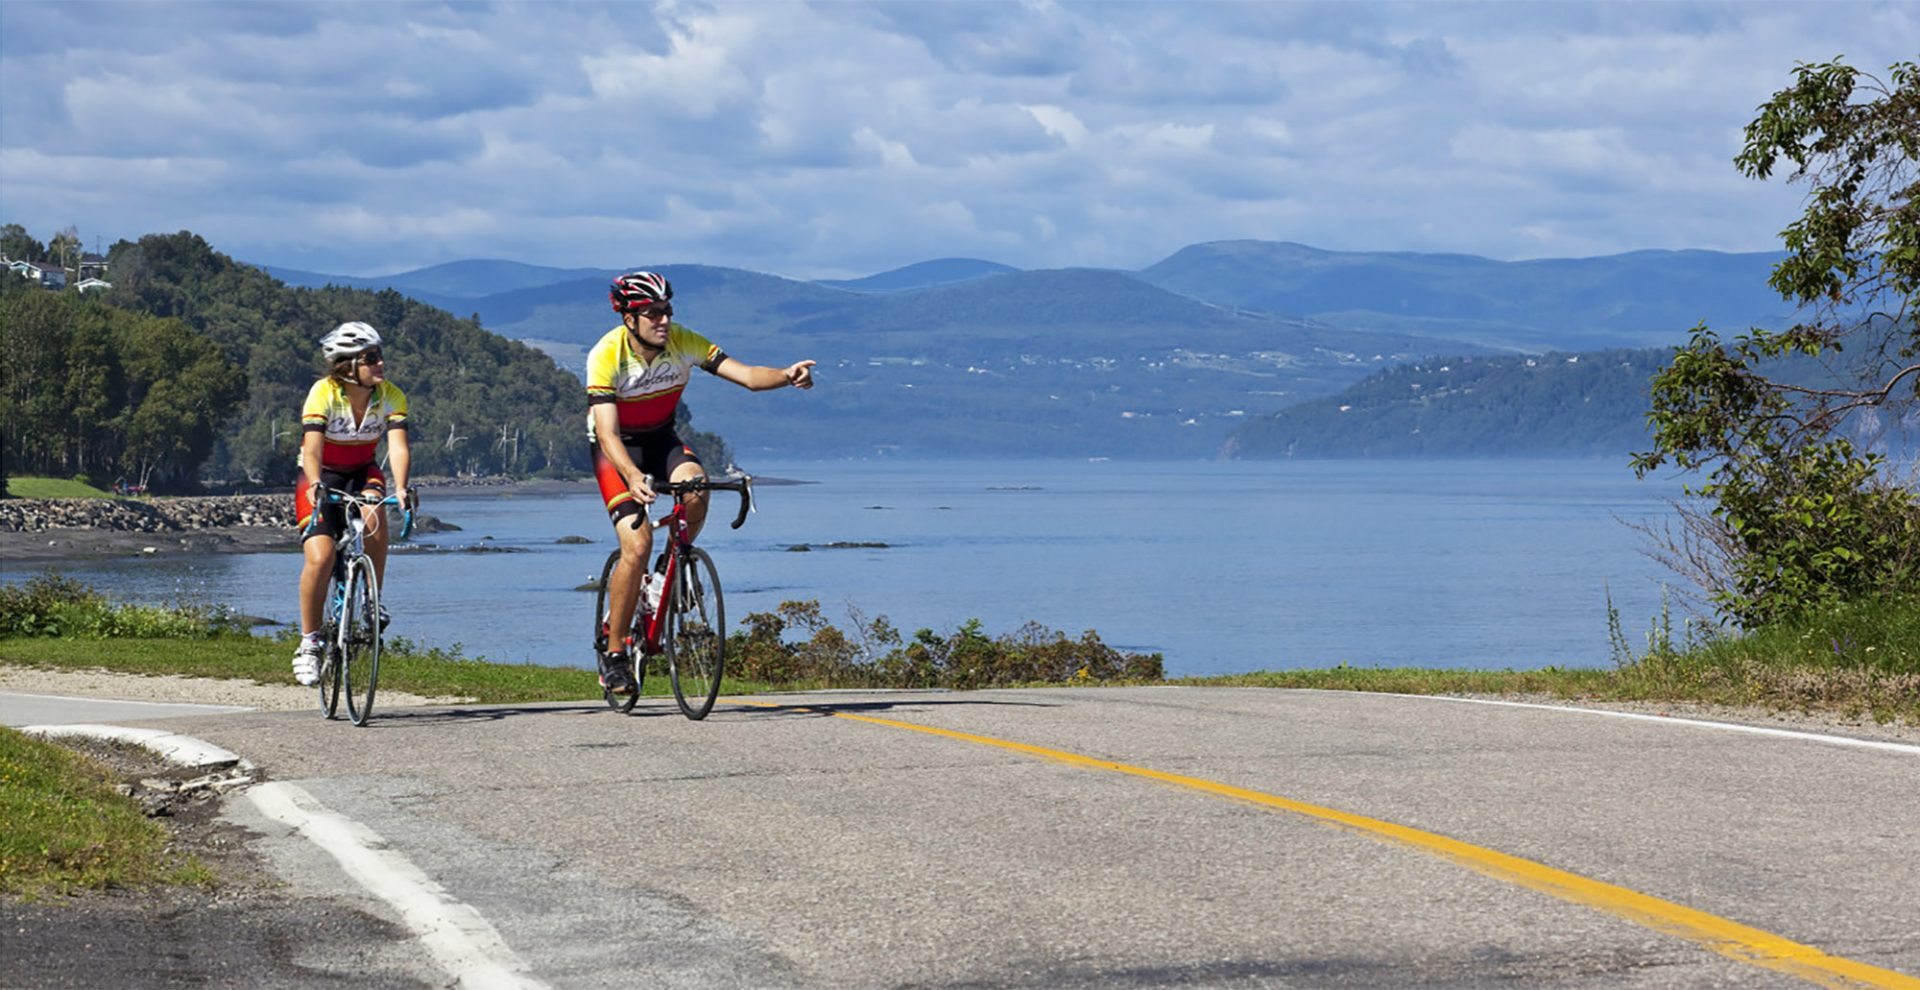 Accueil temporaire : Vélos